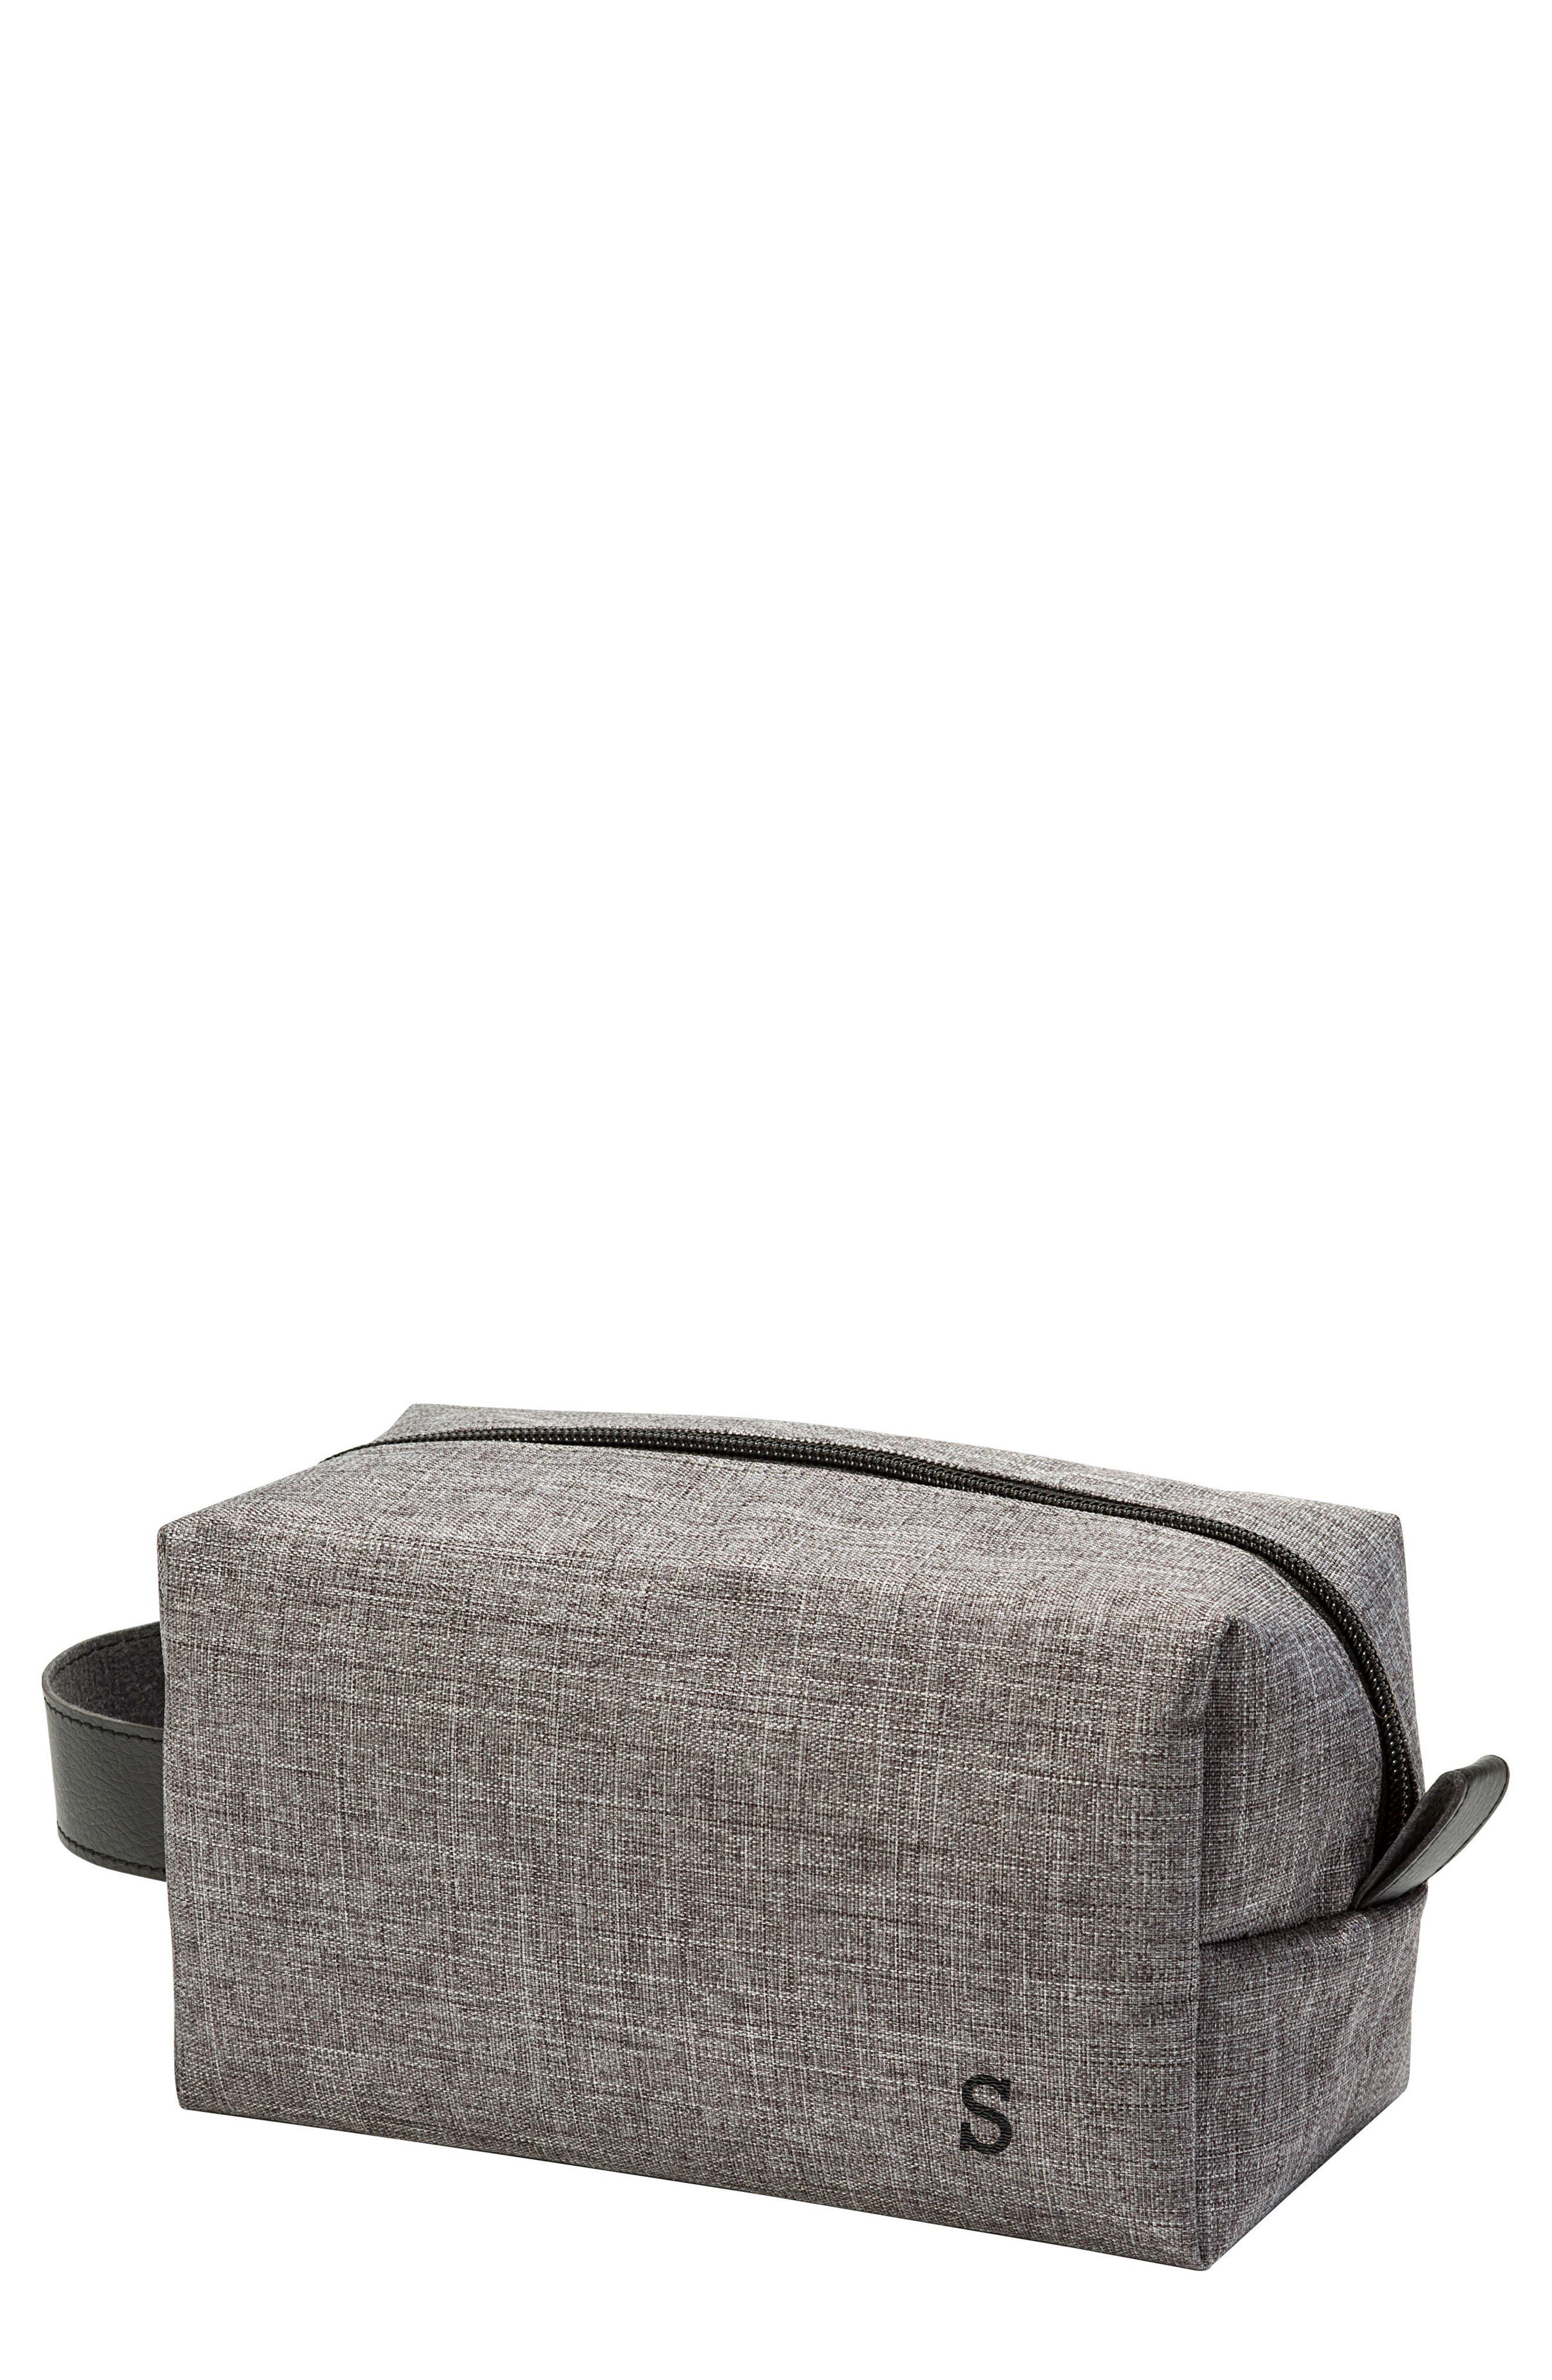 Monogram Dopp Travel Kit,                         Main,                         color, Grey S